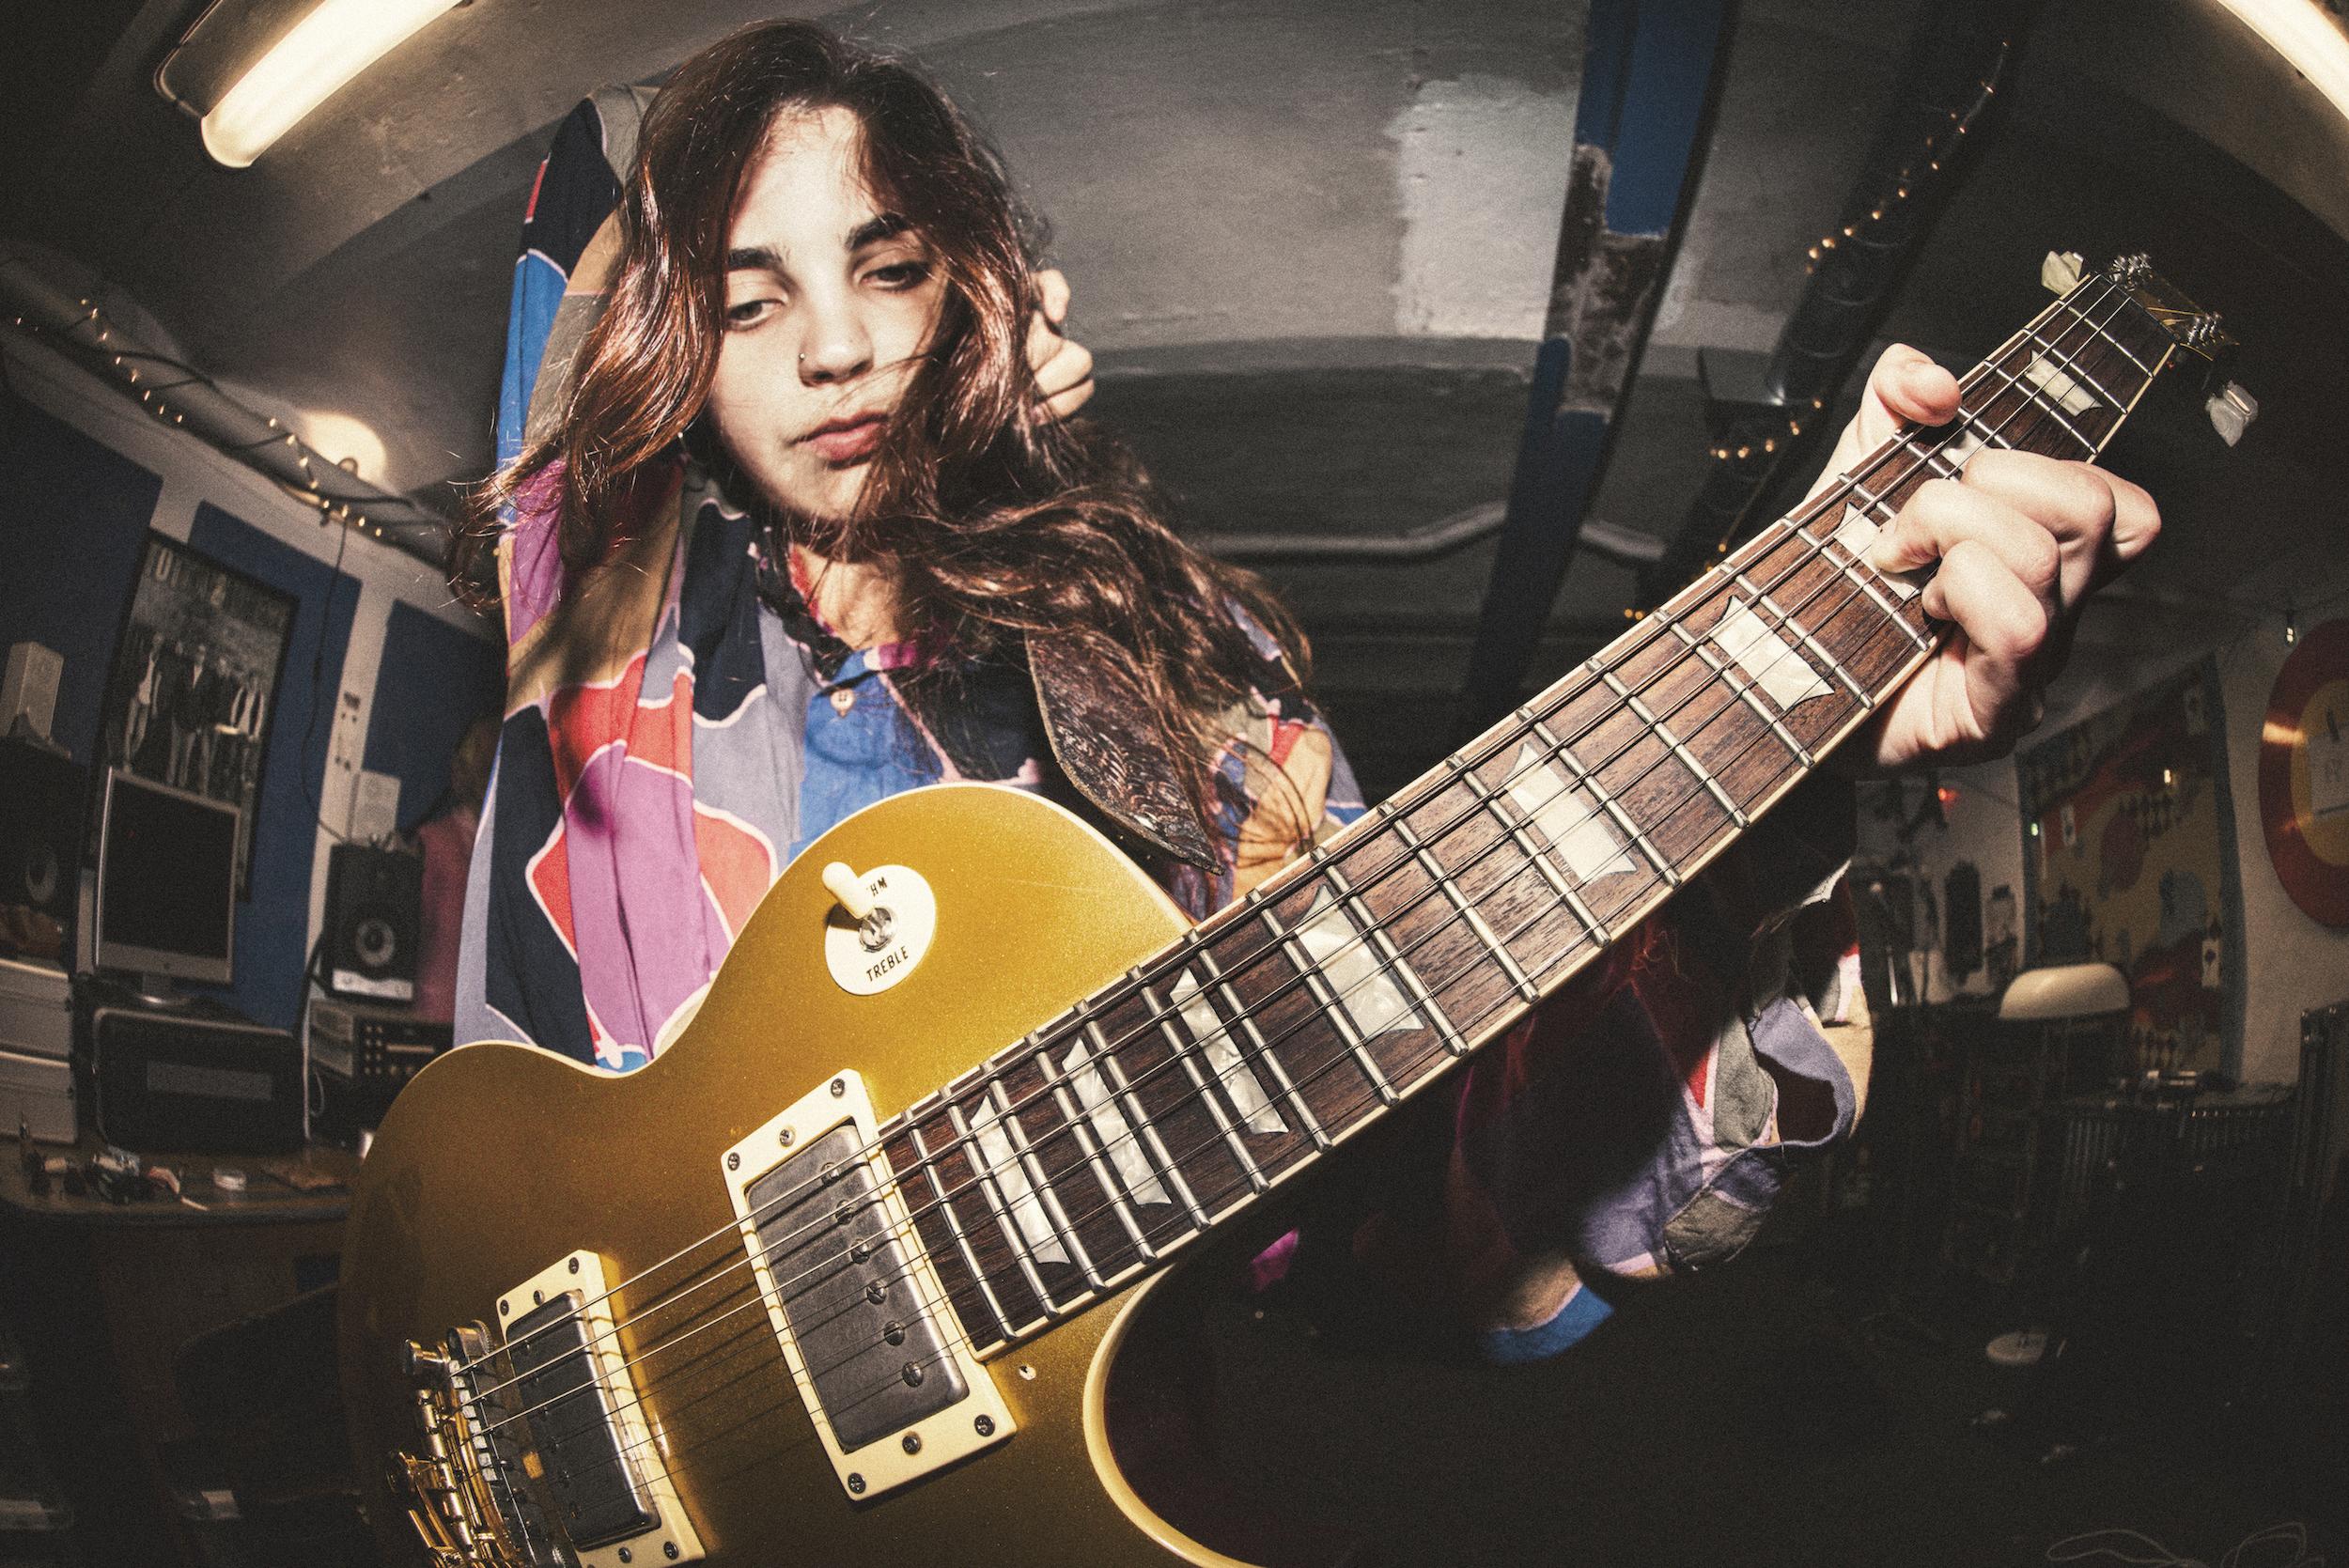 Slowgold Gitarr Foto Ellika Henrikson Highres Kopia